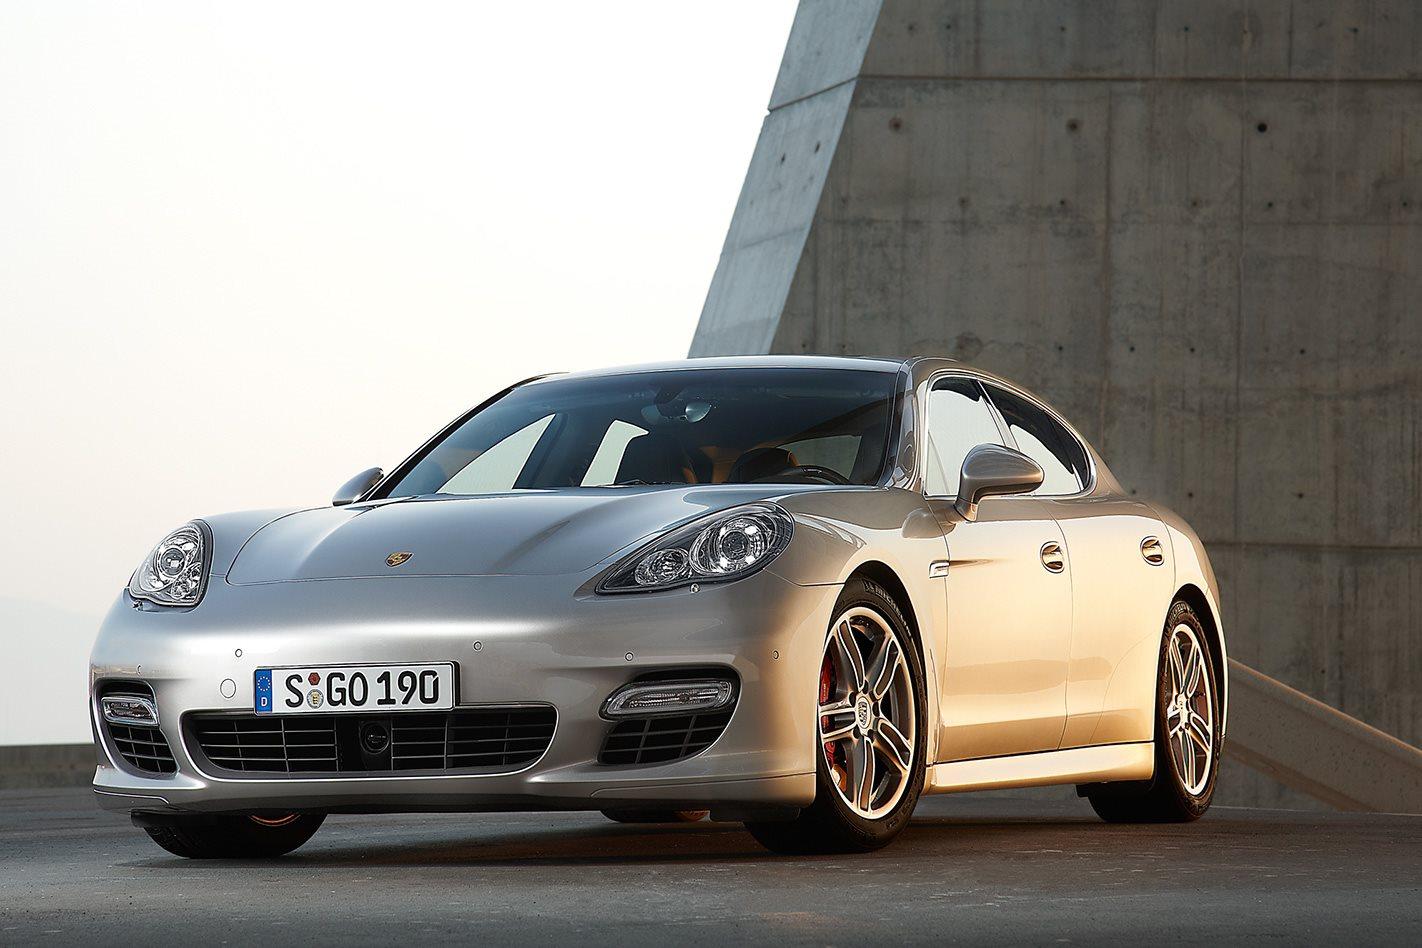 2010 Porsche Panamera Turbo front